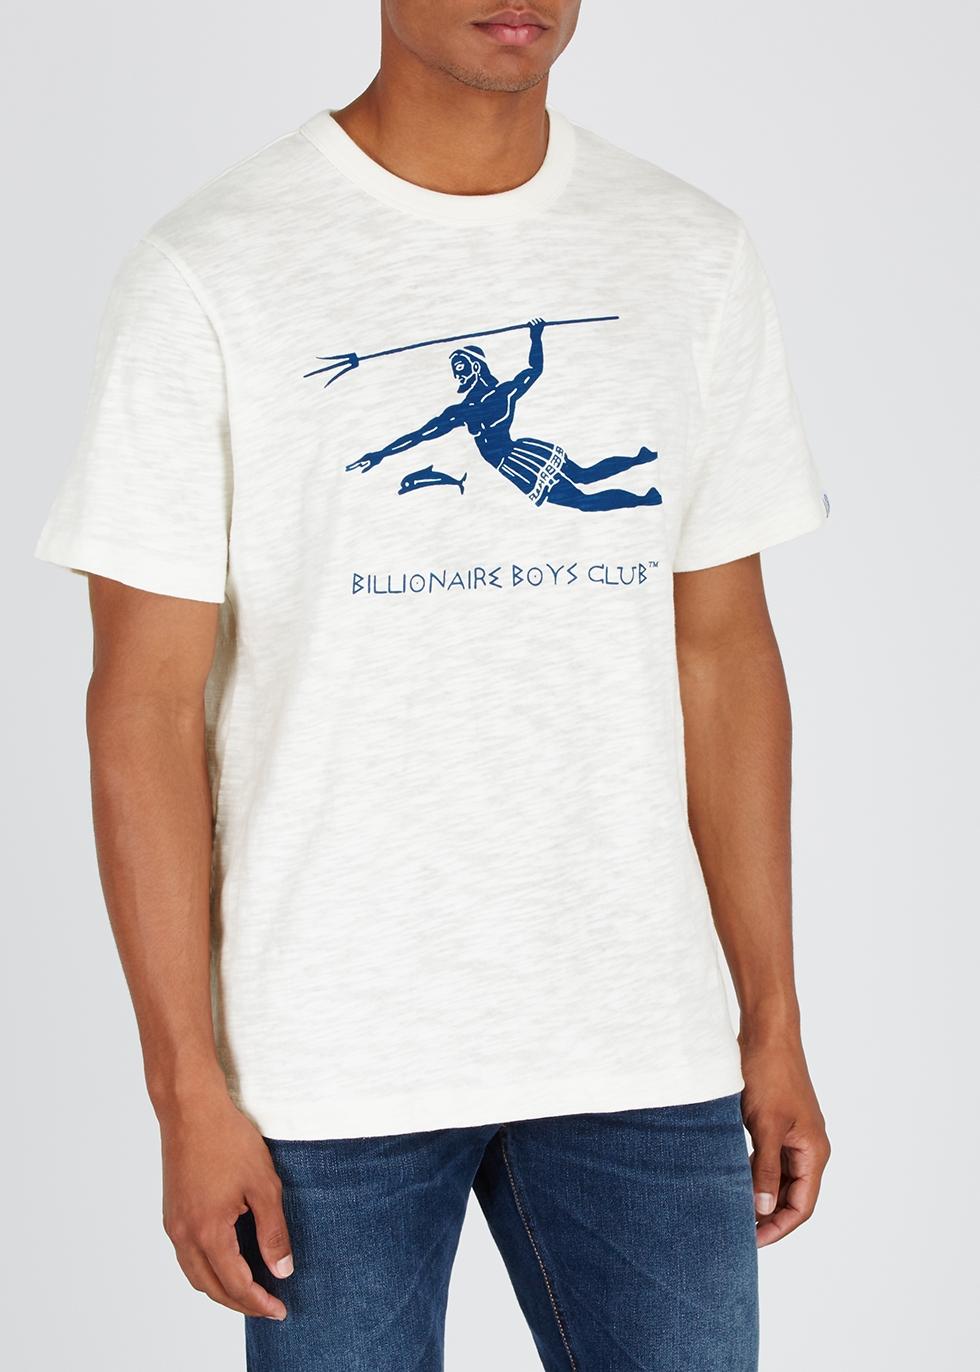 Neptune off-white jersey T-shirt - Billionaire Boys Club